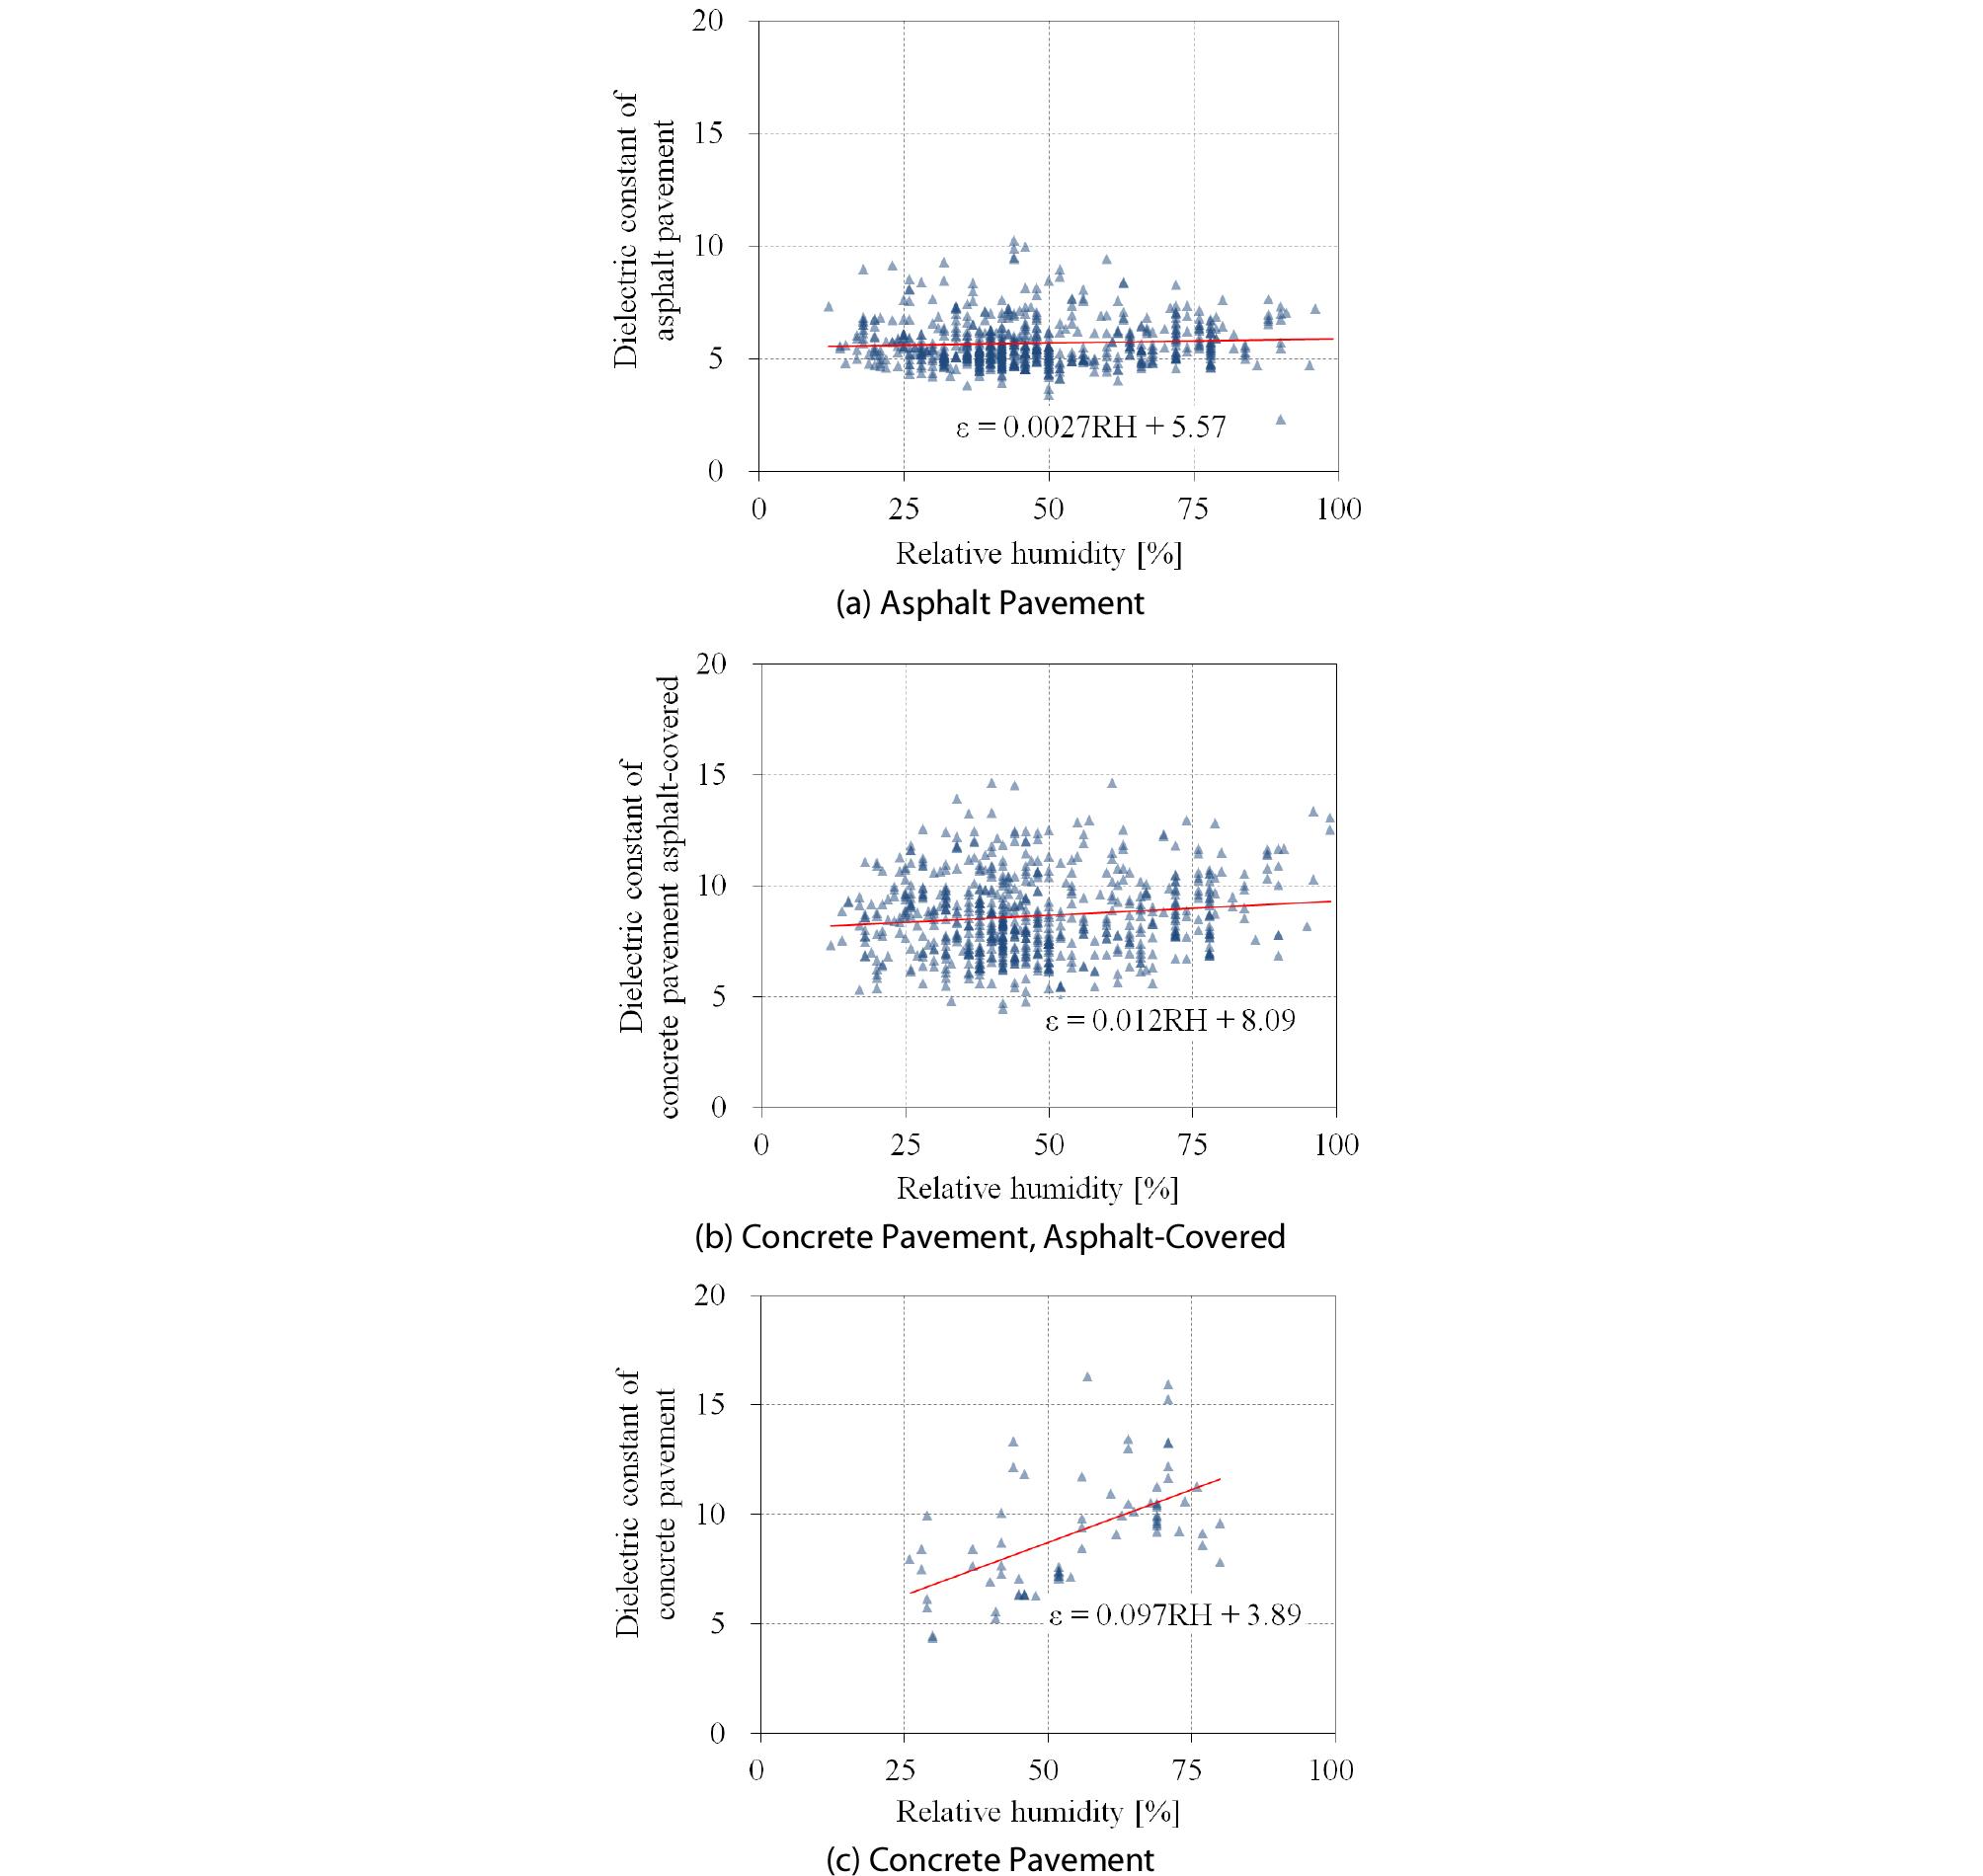 http://static.apub.kr/journalsite/sites/ksce/2020-040-03/N0110400303/images/Figure_KSCE_40_03_03_F4.jpg